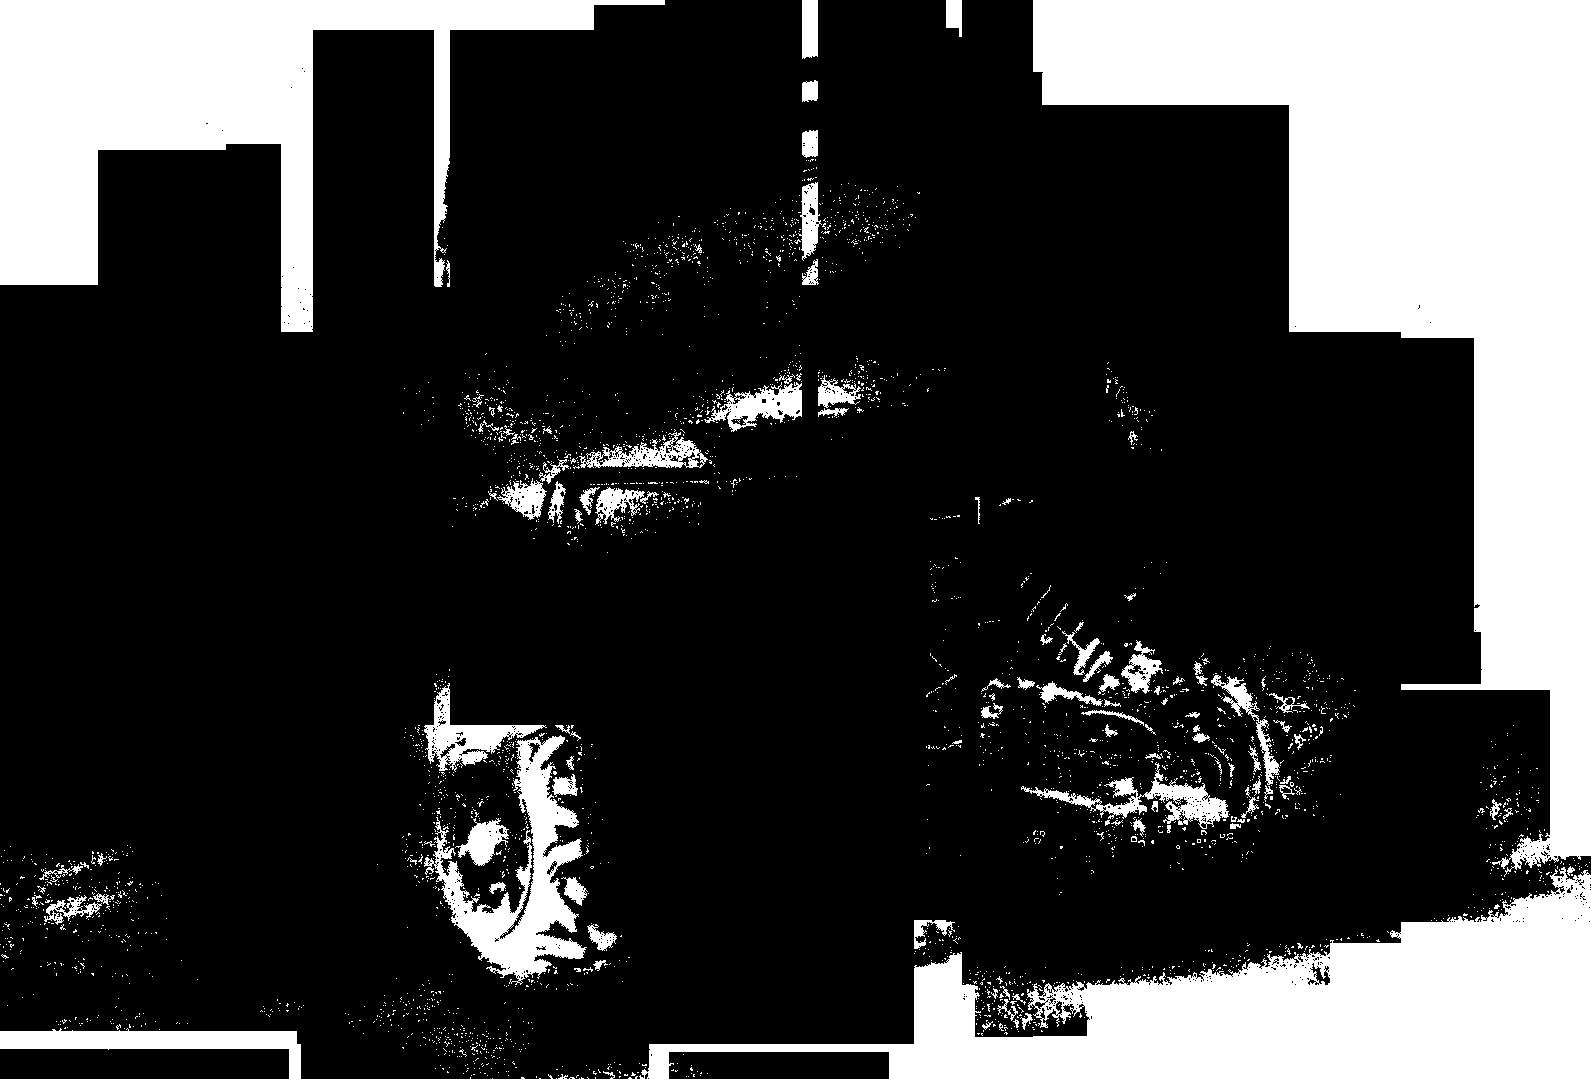 Atv Clipart Utv  Atv Utv Transparent Free For Download On